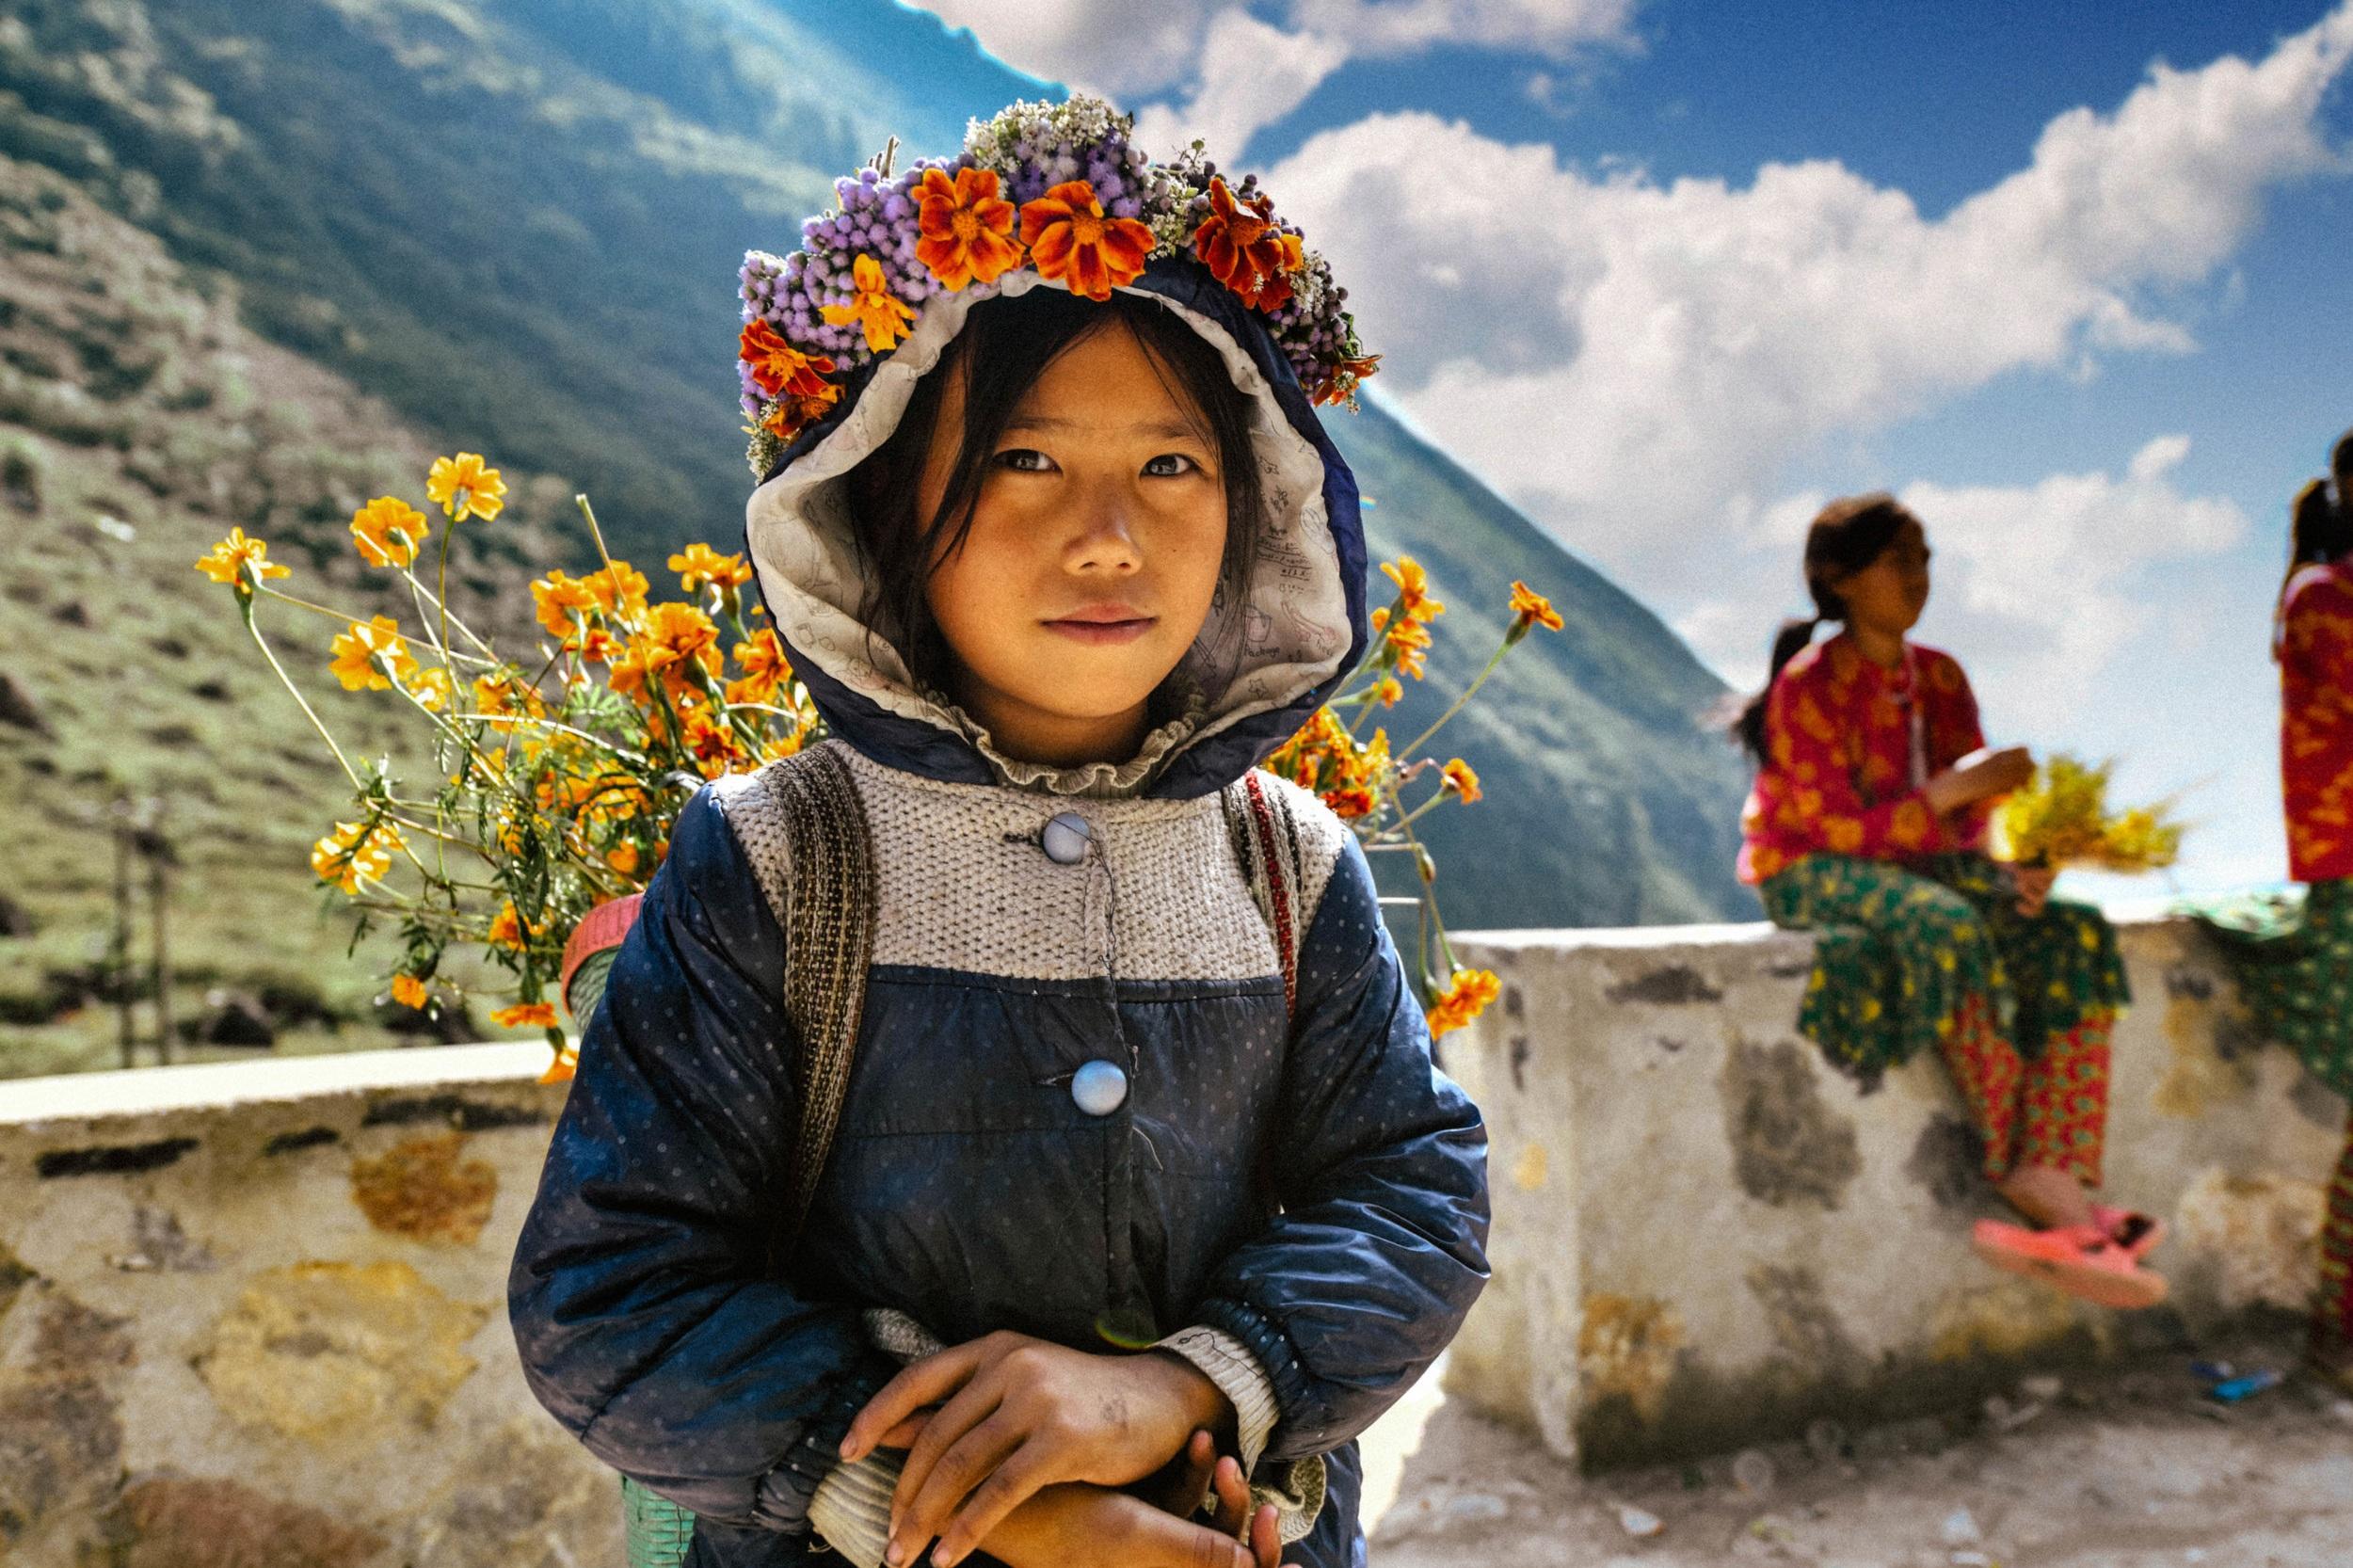 Hmong flower girl in traditional dress